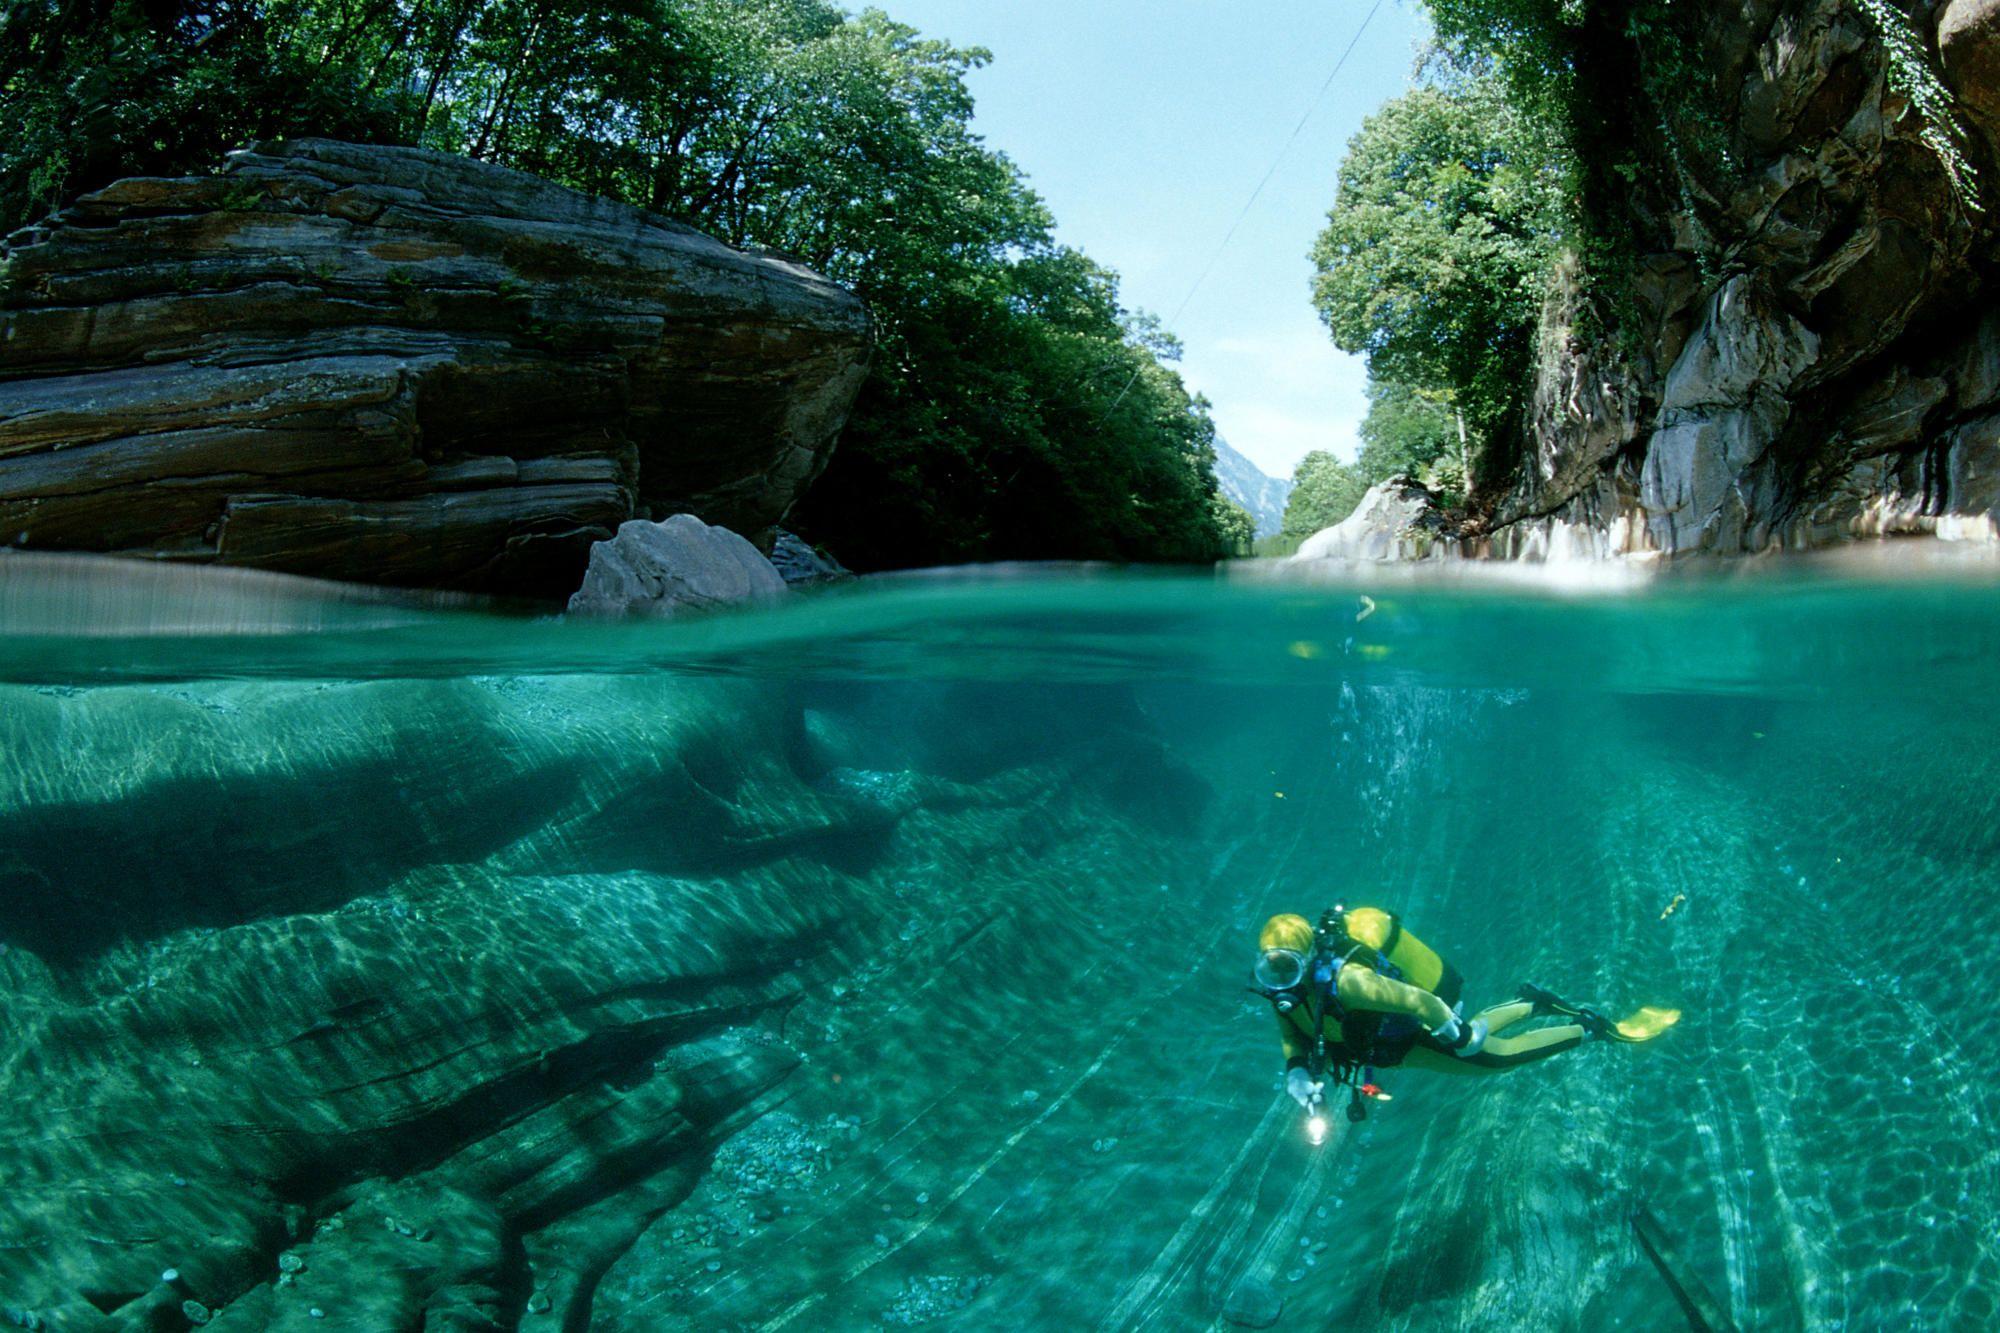 Flusstauchen in der Verzasca, Scubadiving in a freshwater river,